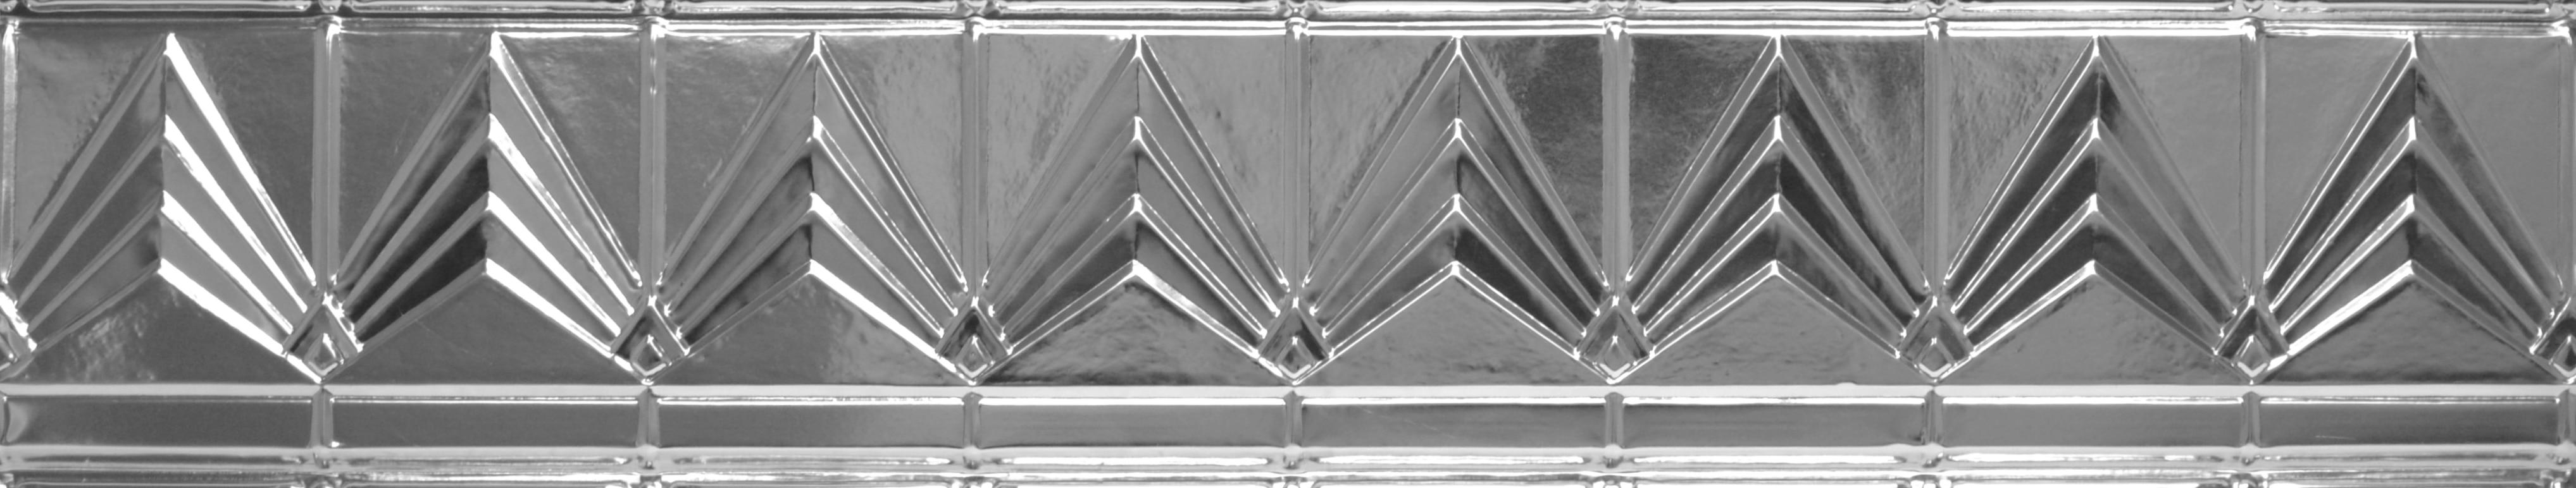 Deco Diamonds and Pearls - Shanko Tin Cornice - #904